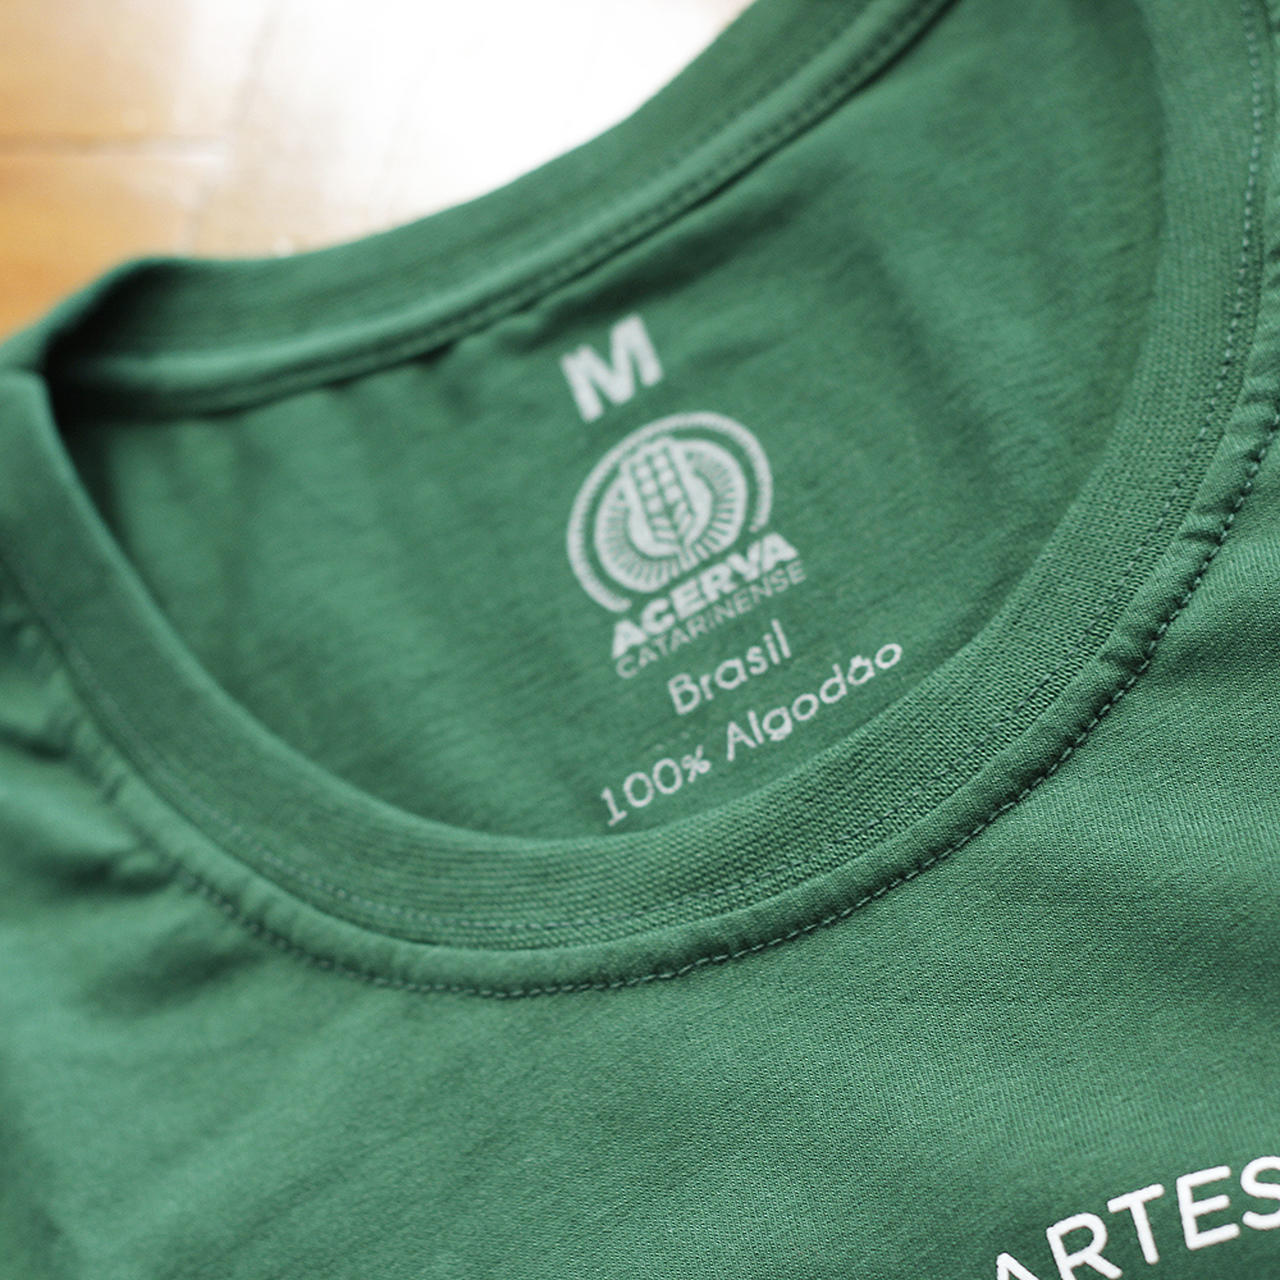 Camiseta Masculina Acerva Catarinense Verde  - Maria Cervejeira